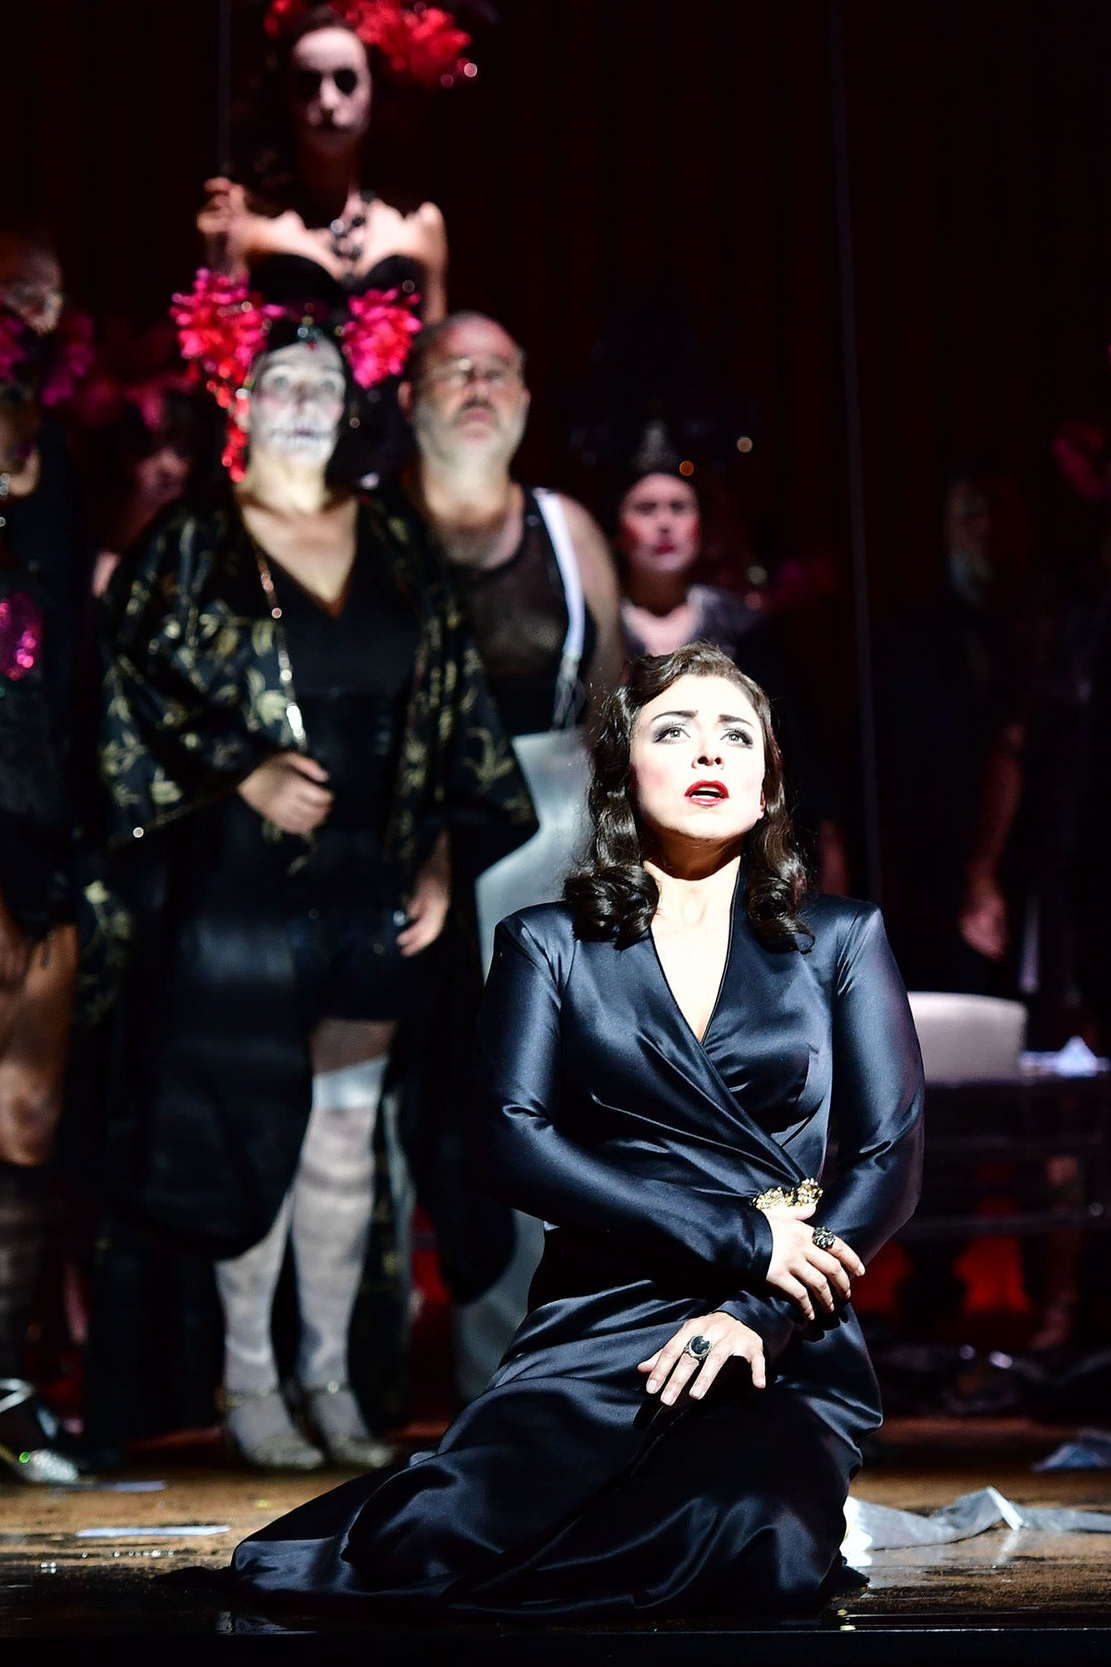 Violetta, La traviata    Theater Basel  January 29; February 4, 9, 17, 25 2018   new production